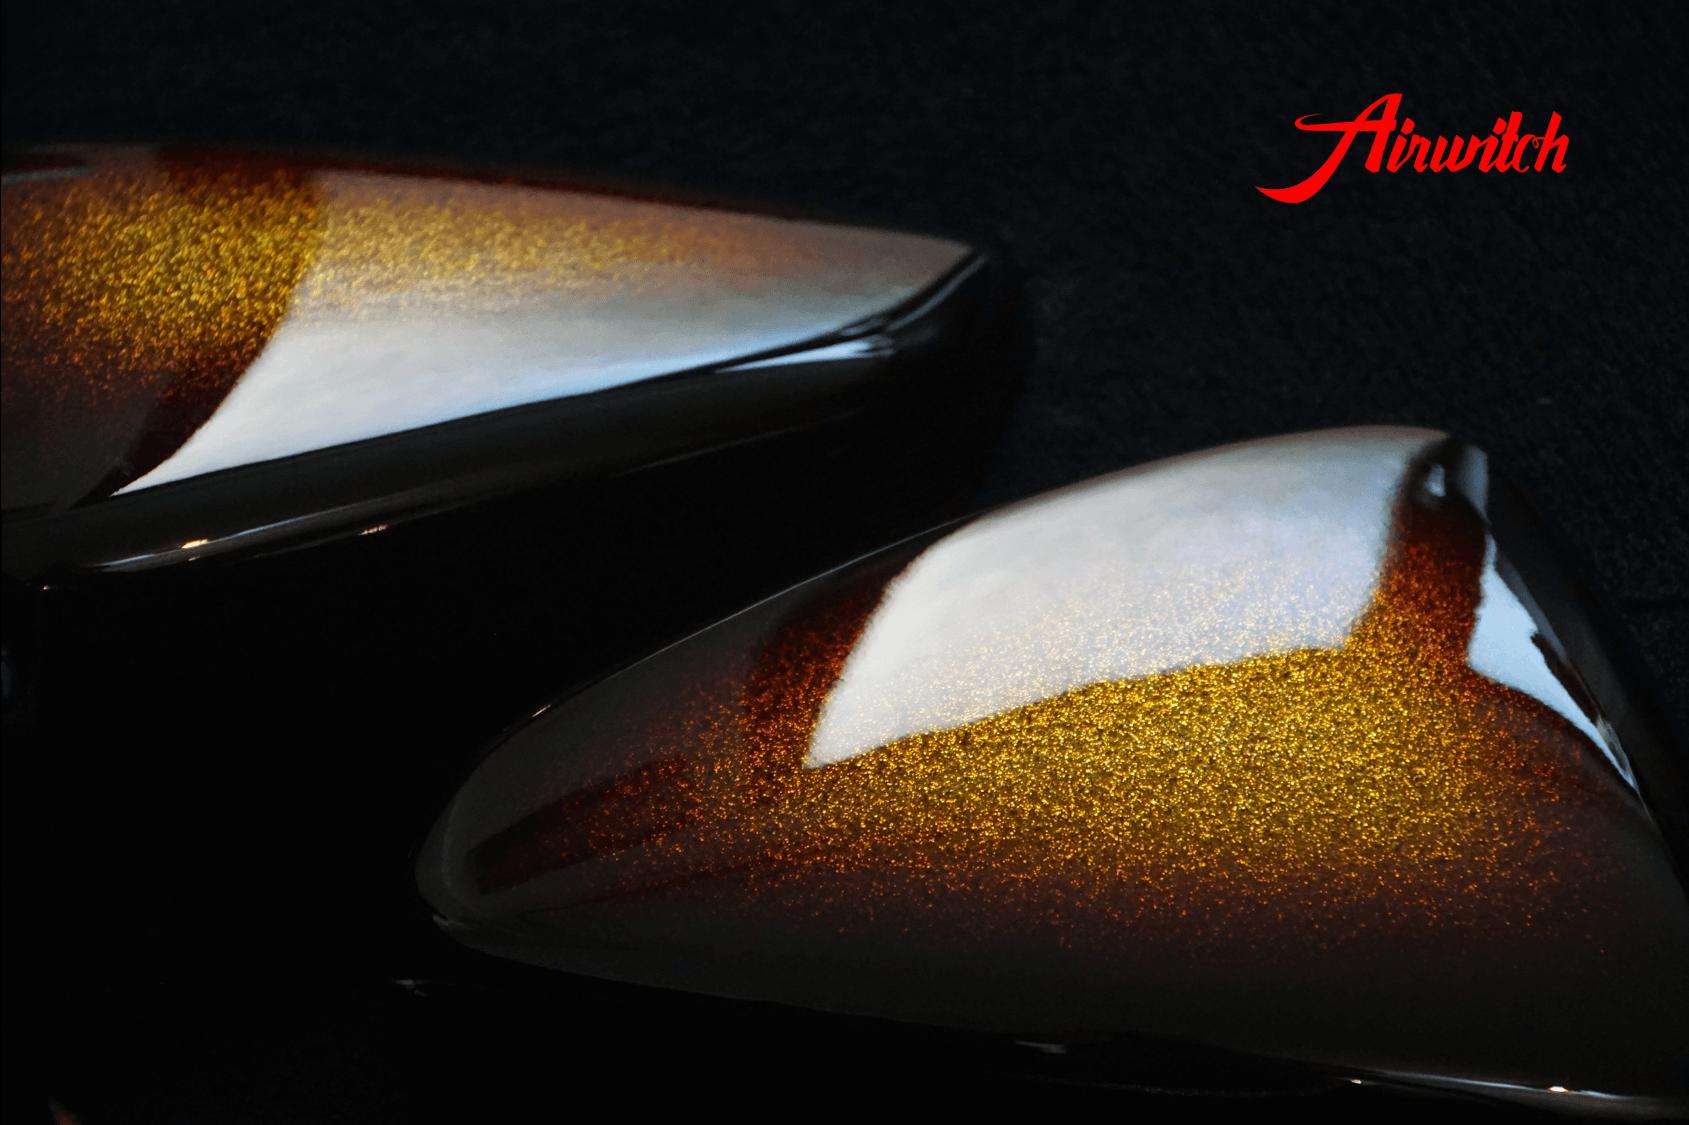 Custom Paint Candy Suzuki Savage Fender Tank Metalflake Lackierung Candy gold brown oldschool chopper